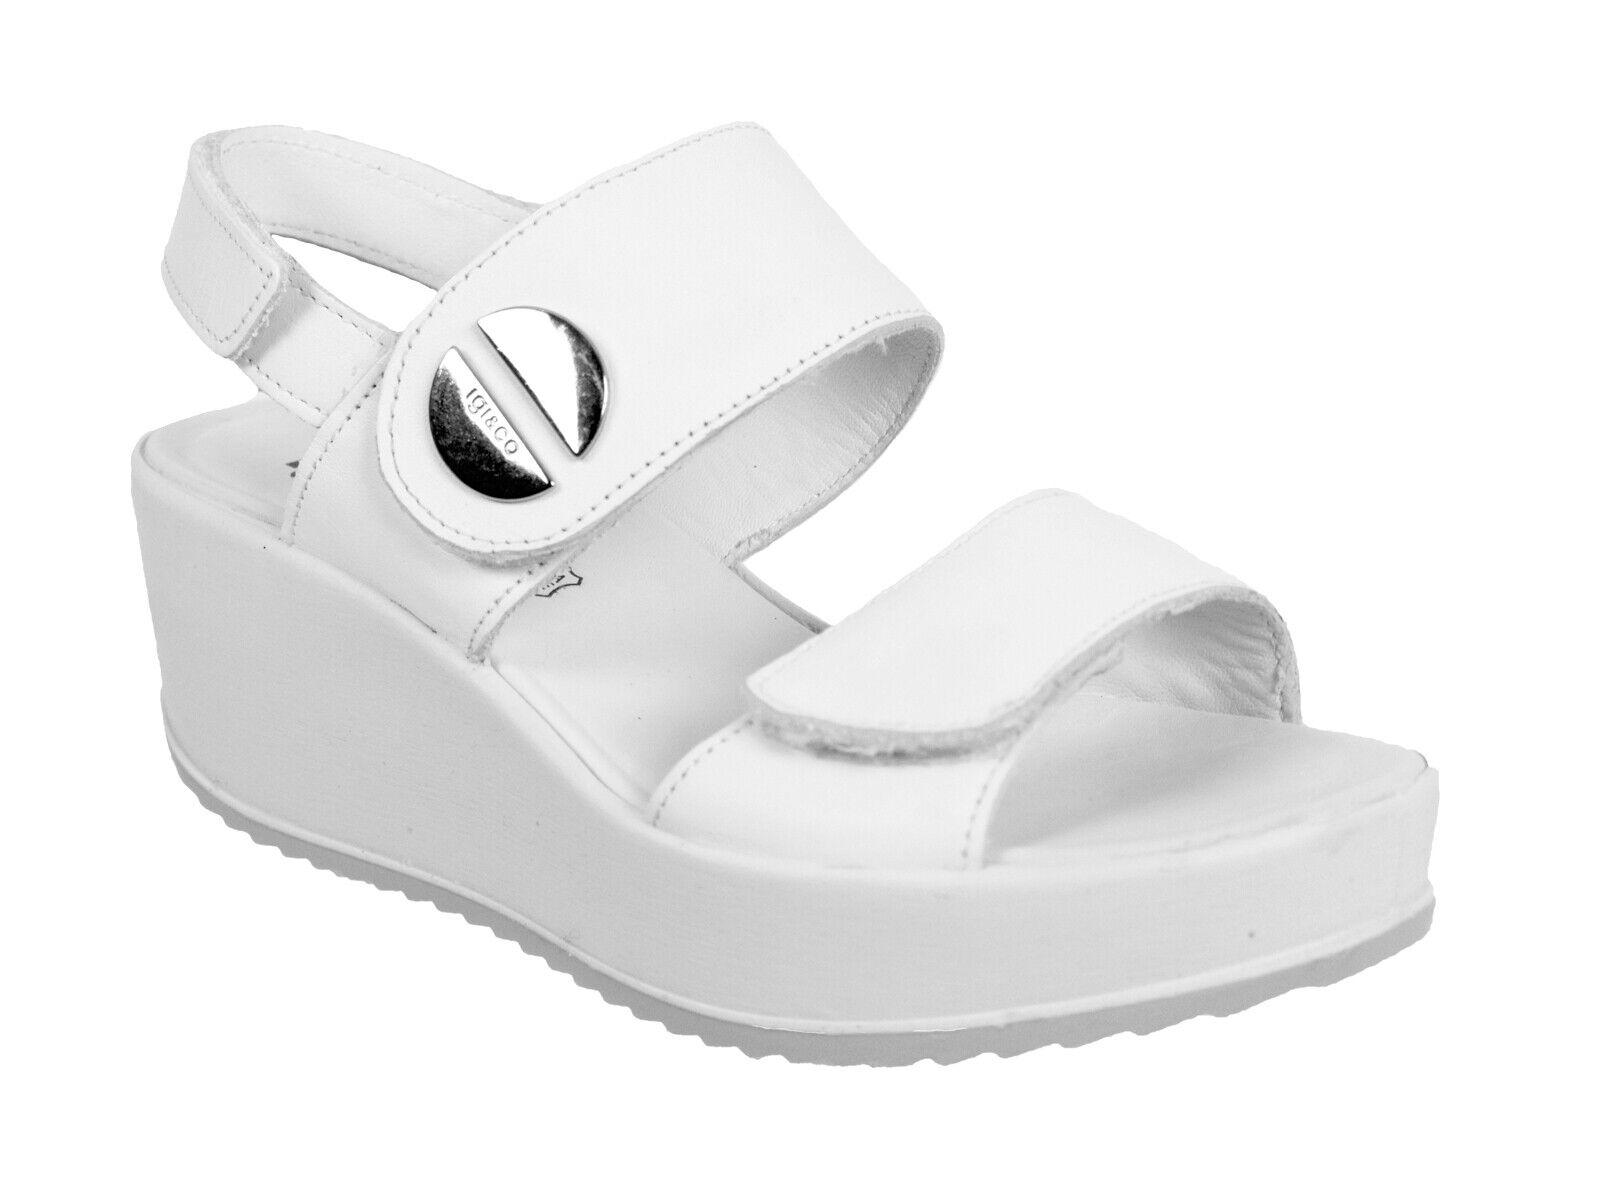 Chaussures SANDALI CON ZEPPA femmes IGI&CO ESTATE 3173322  CANDY BIANCO